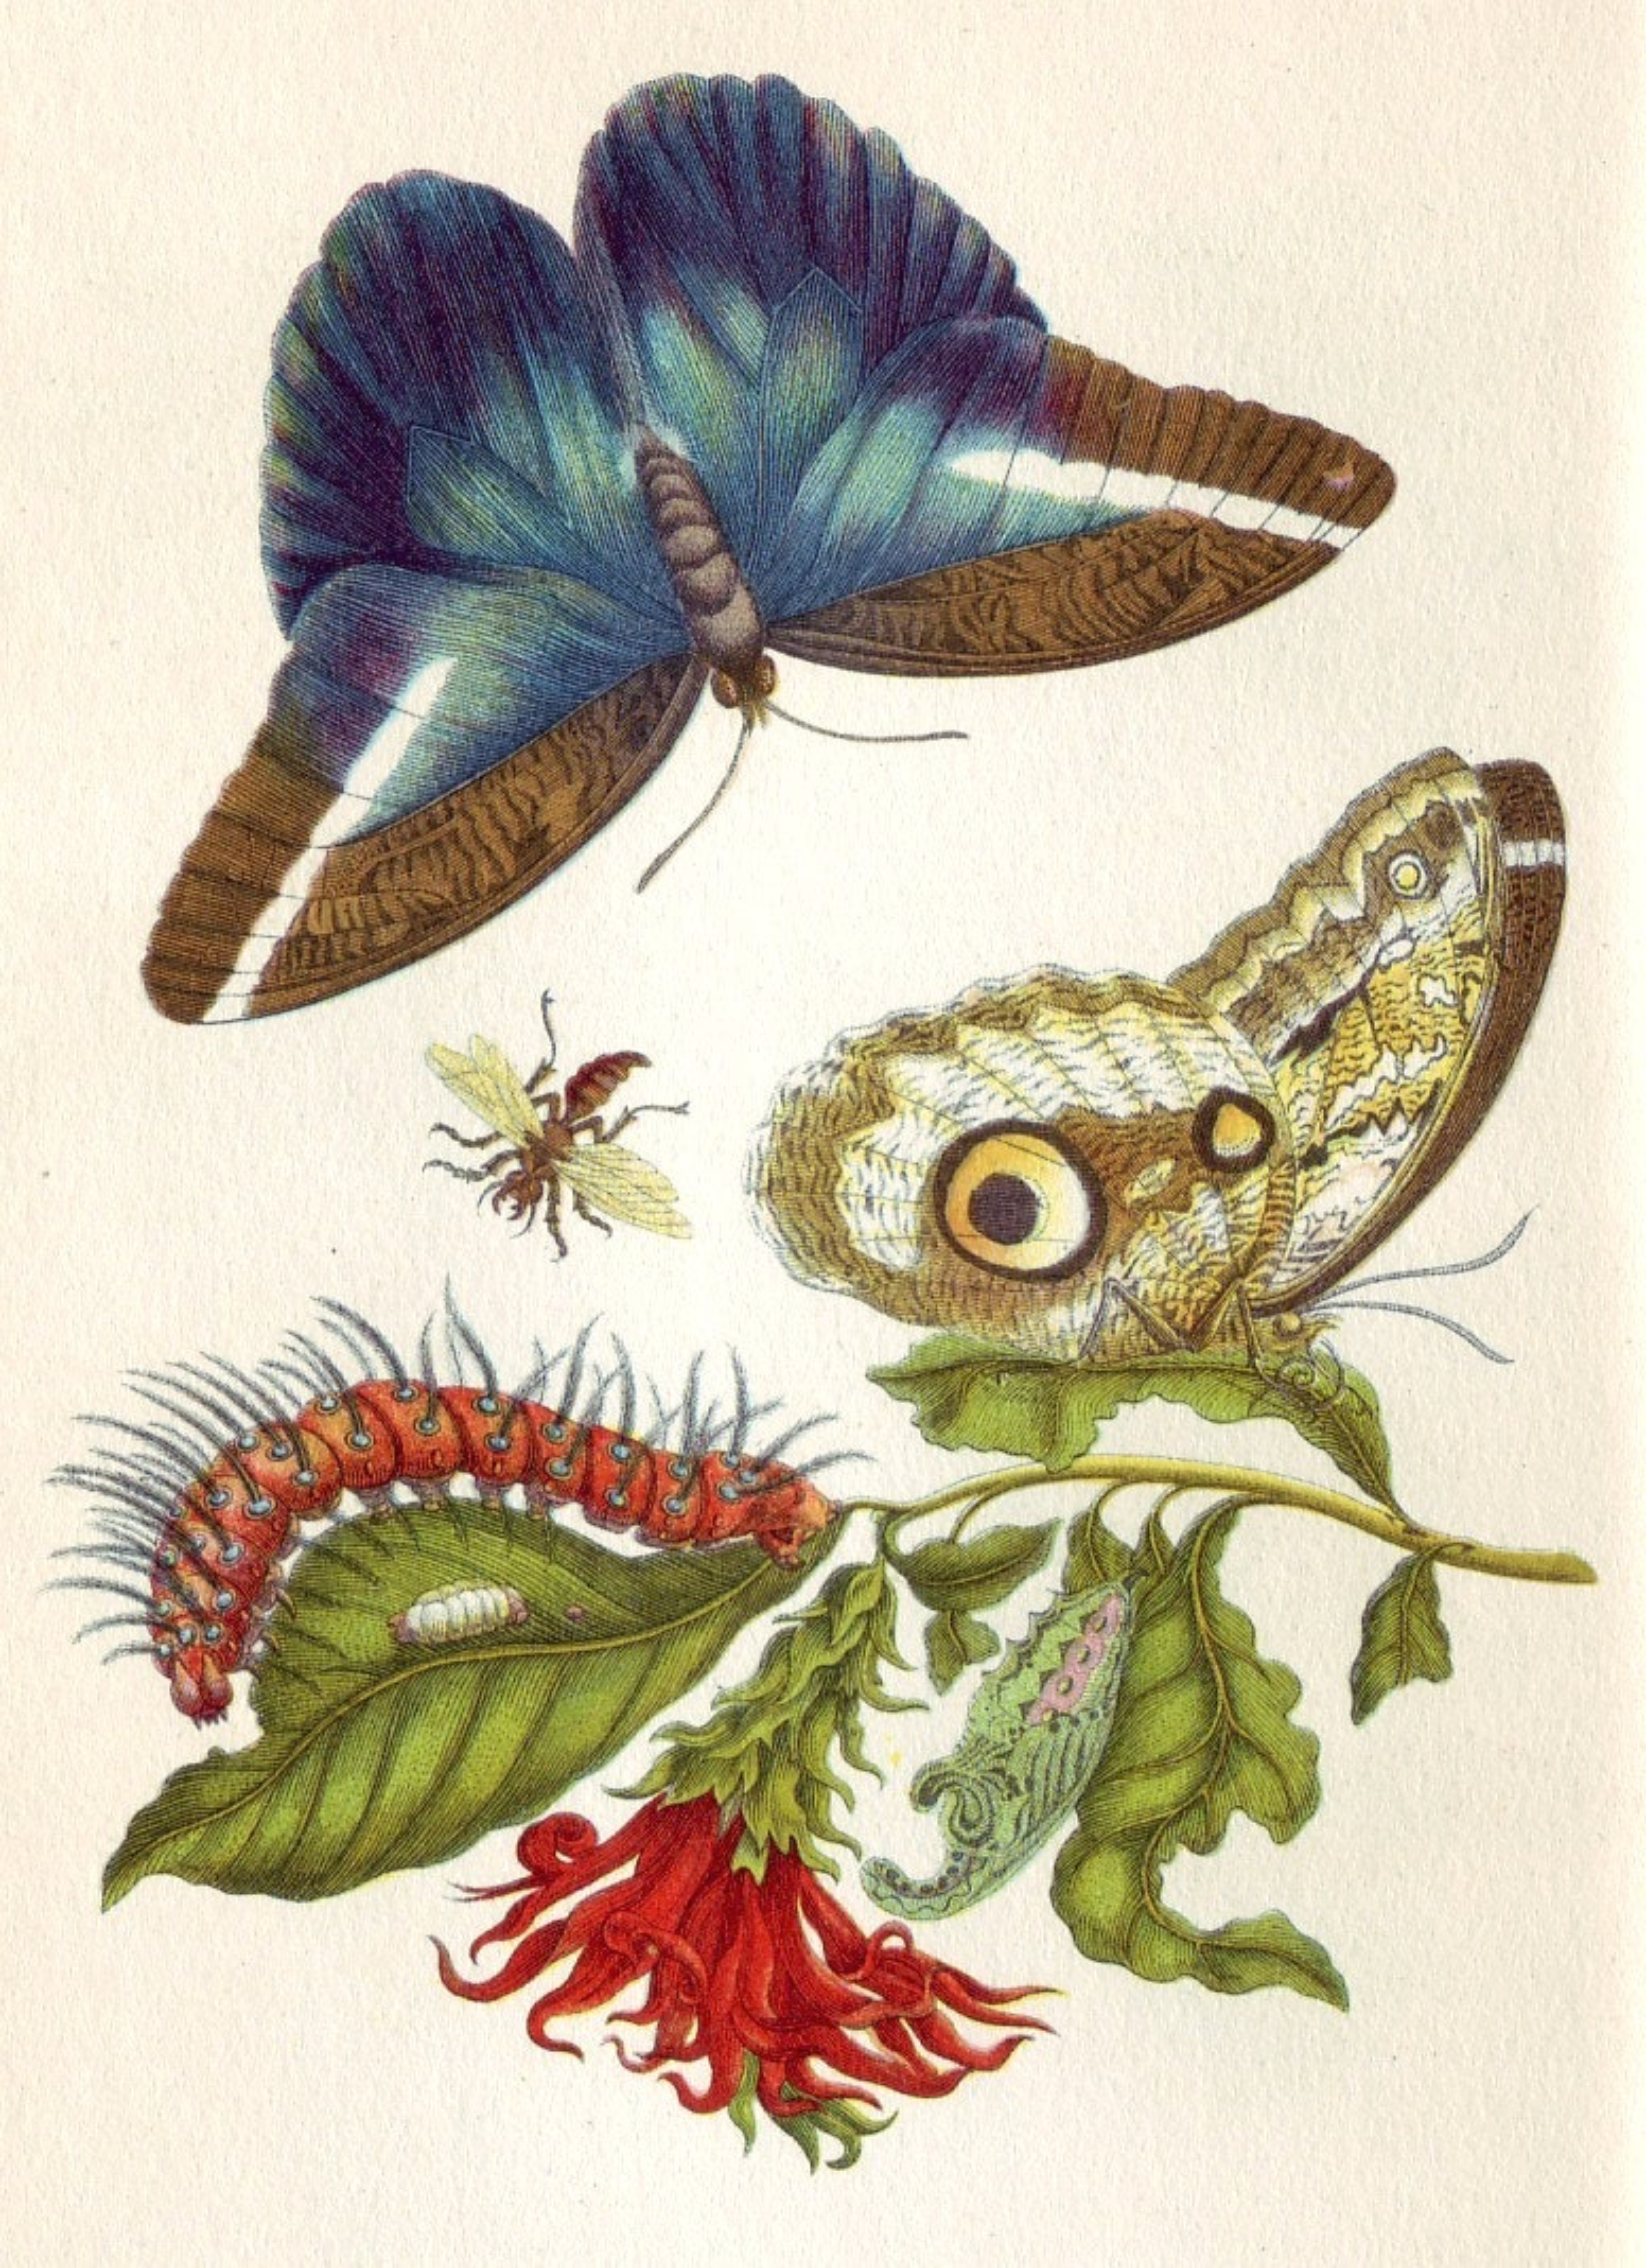 An image from Merian's book Metamorphosis insectorum Surinamensium. Credit: Wikimedia Commons